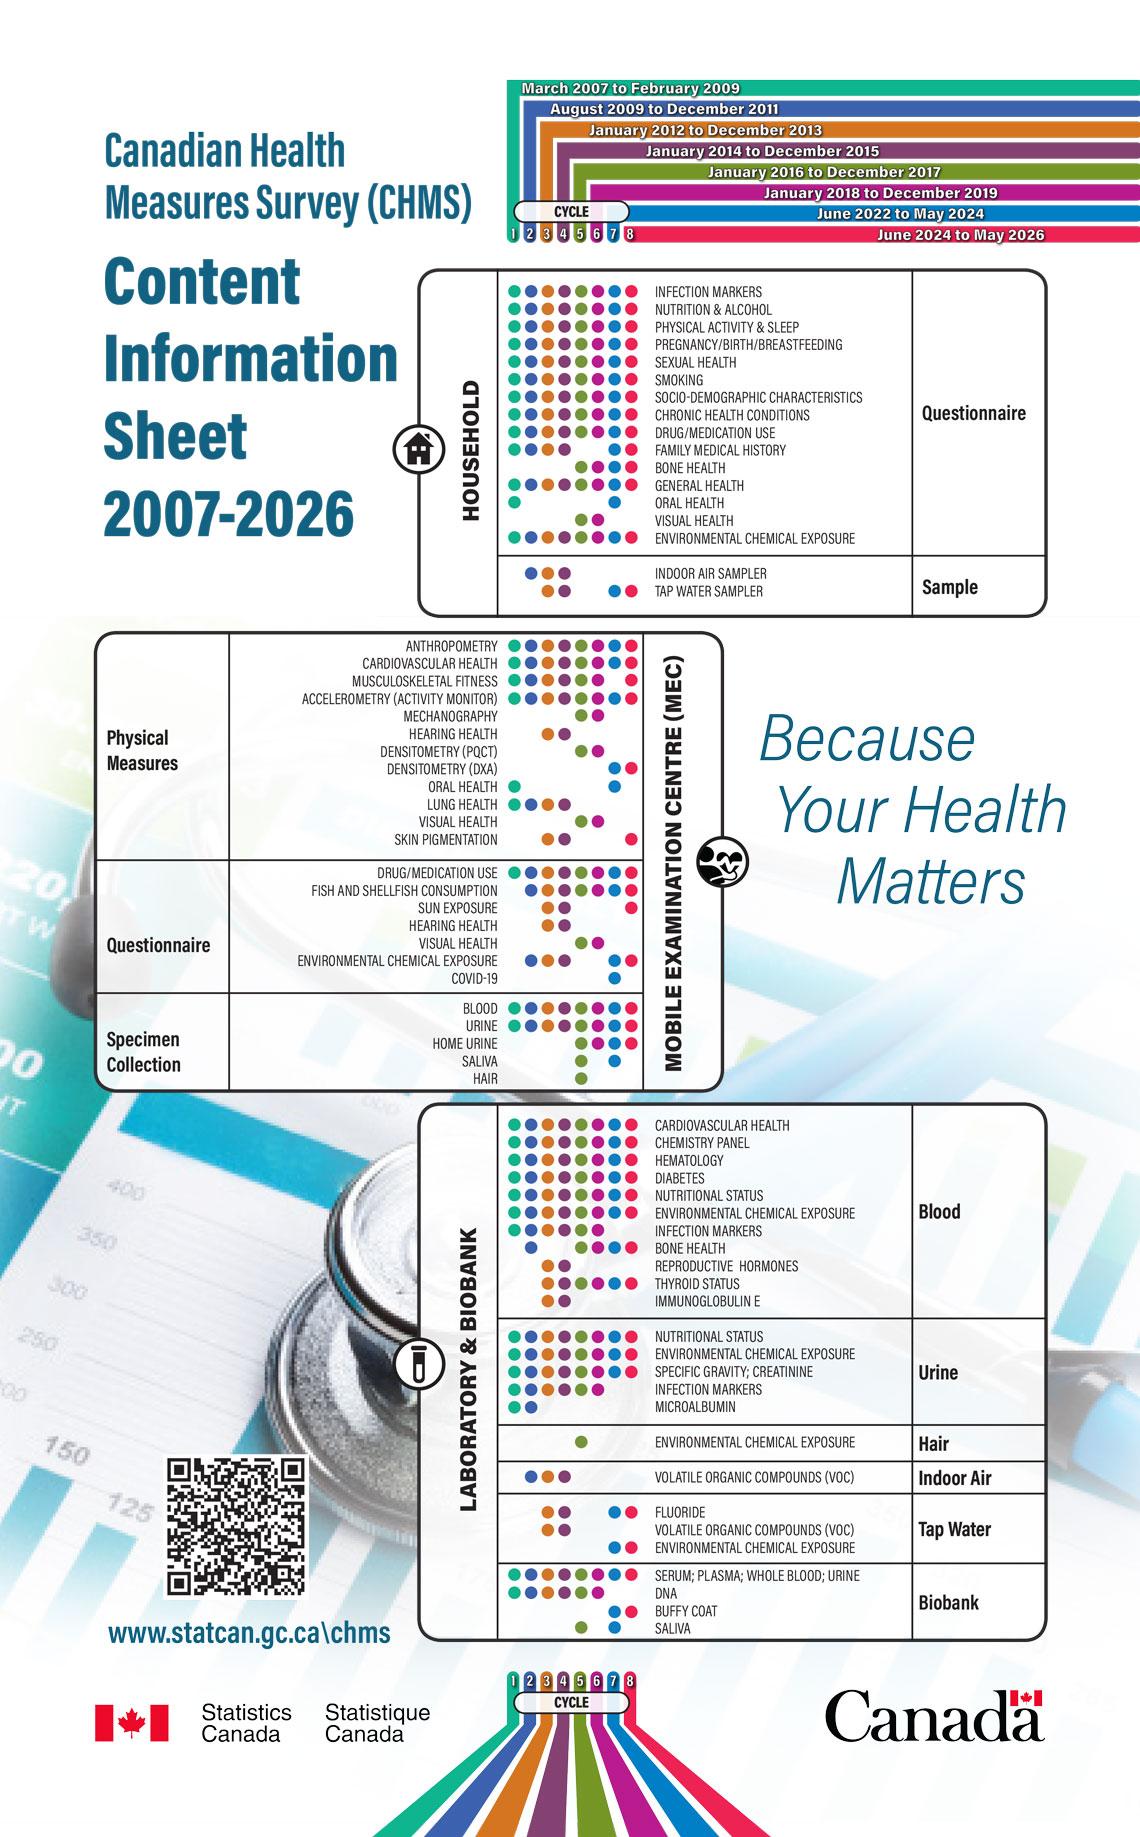 Canadian Health Measures Survey (CHMS) – Content Information Sheet 2007-2023